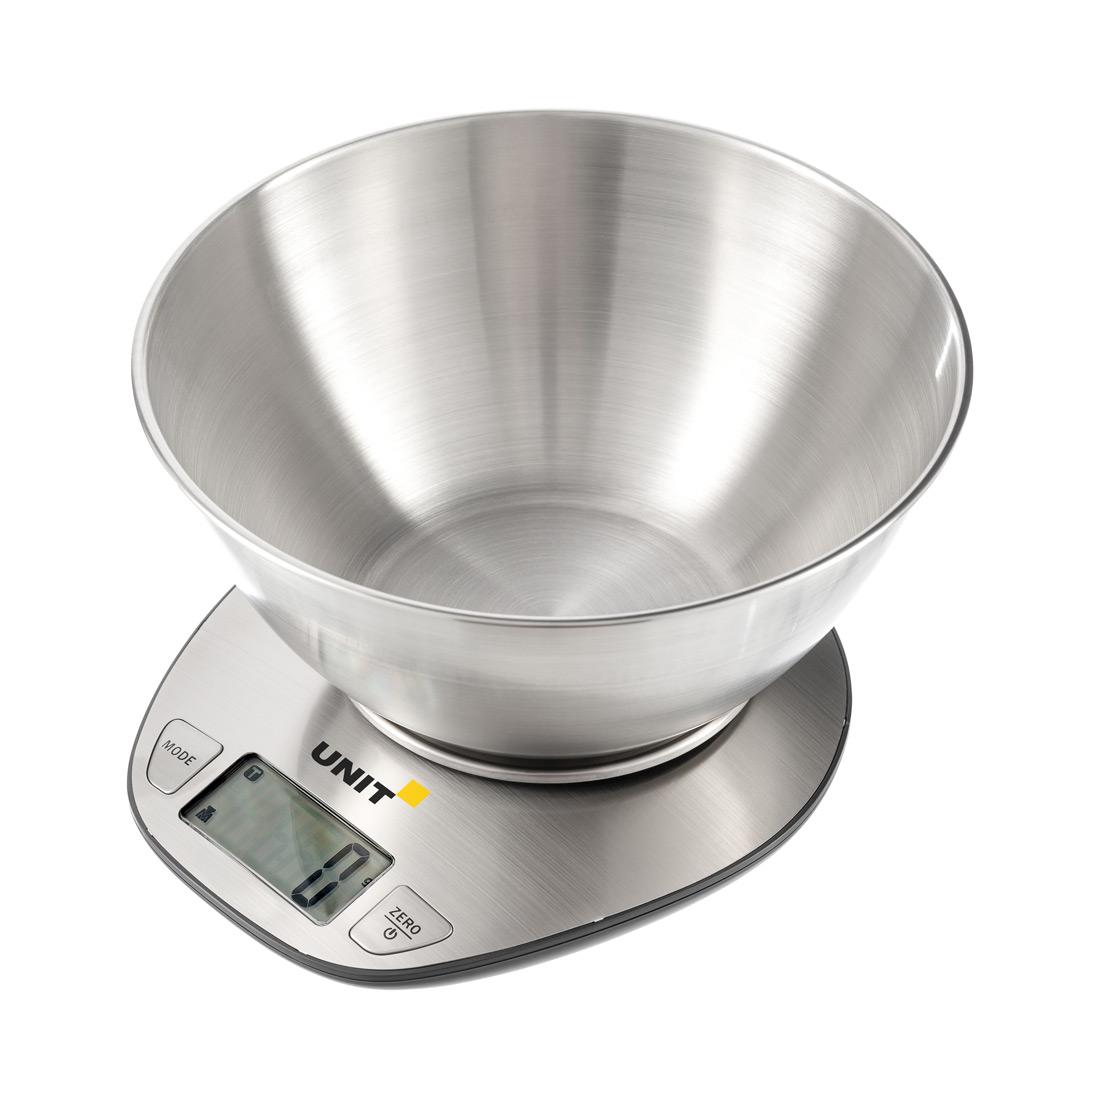 Весы Кухонные электронные UNIT UBS-2153 salter 1066 gndr кухонные весы